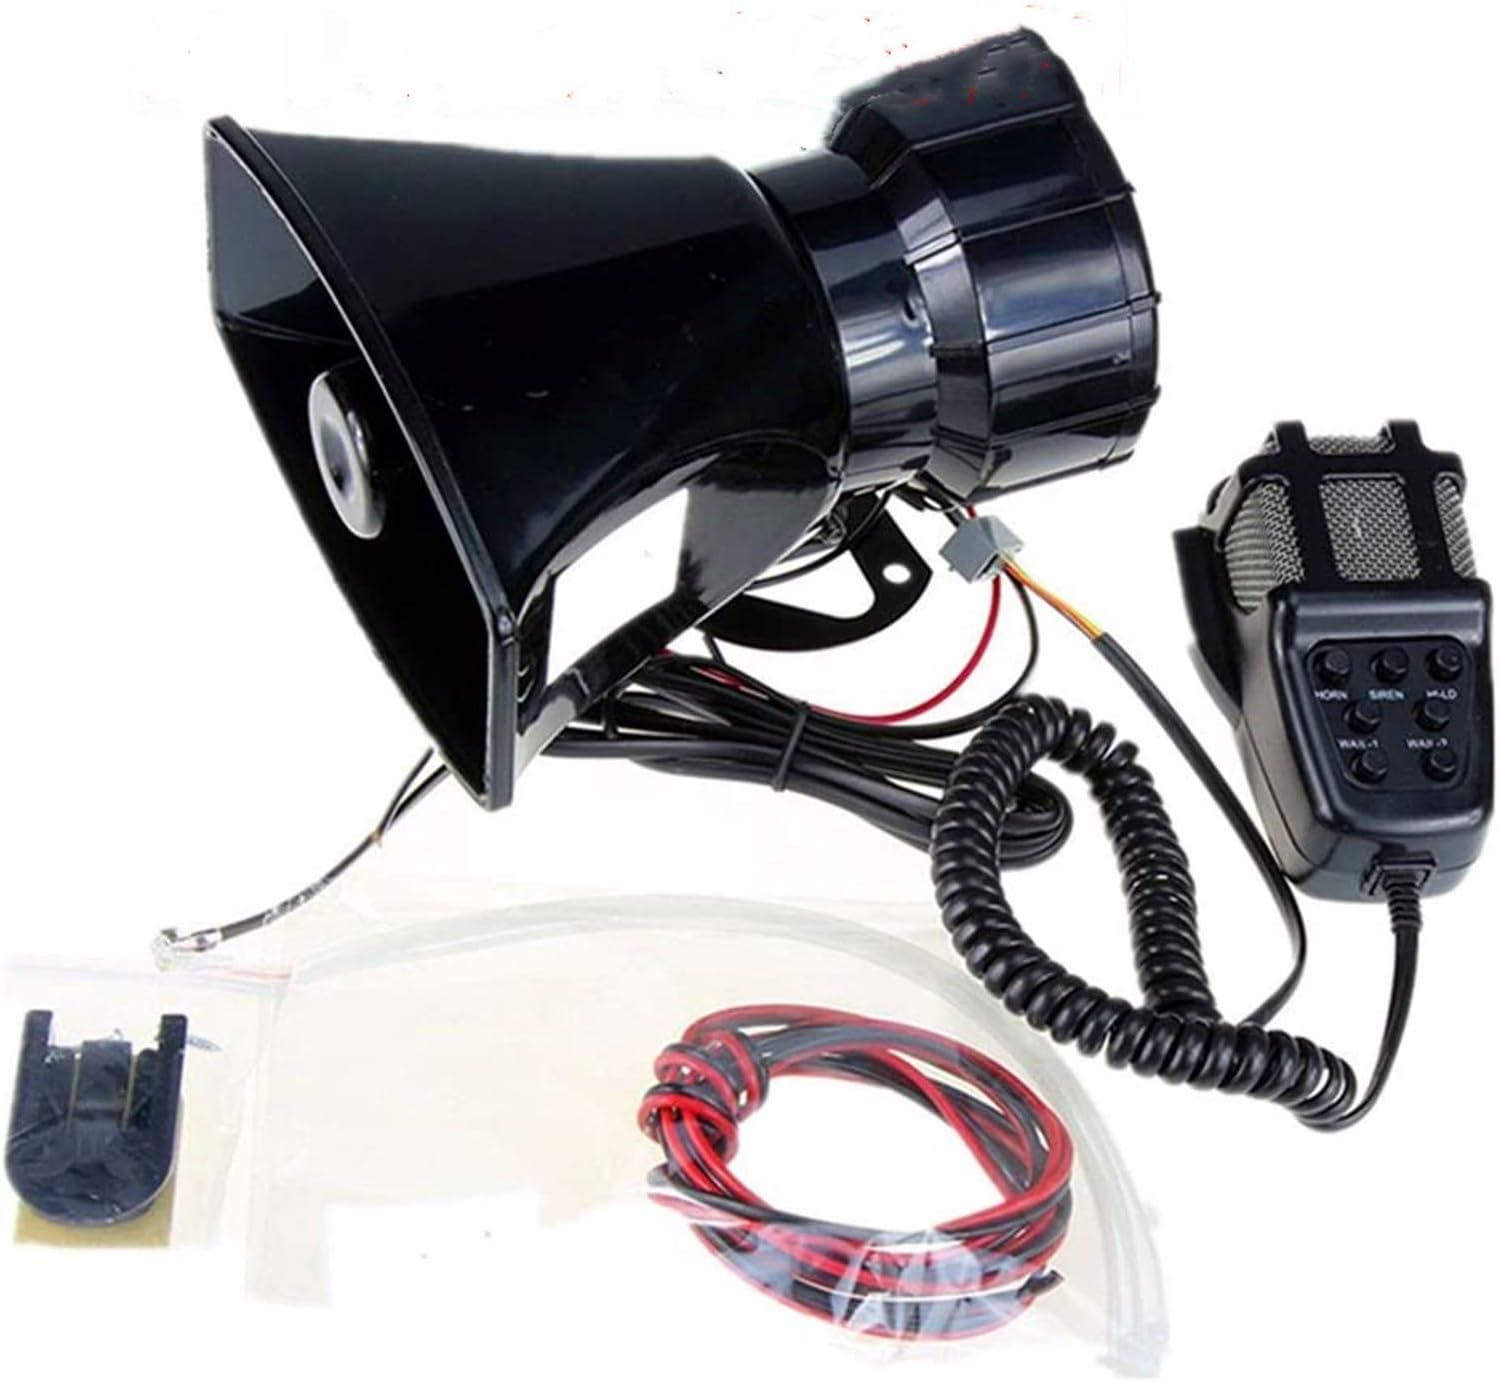 Yida 12v 80w 7 Tone Sound Auto Sirene Fahrzeug Horn Mit Mic Pa Lautsprechersystem Emergency Sound Amplifier Auto Siren Lautsprecher Auto